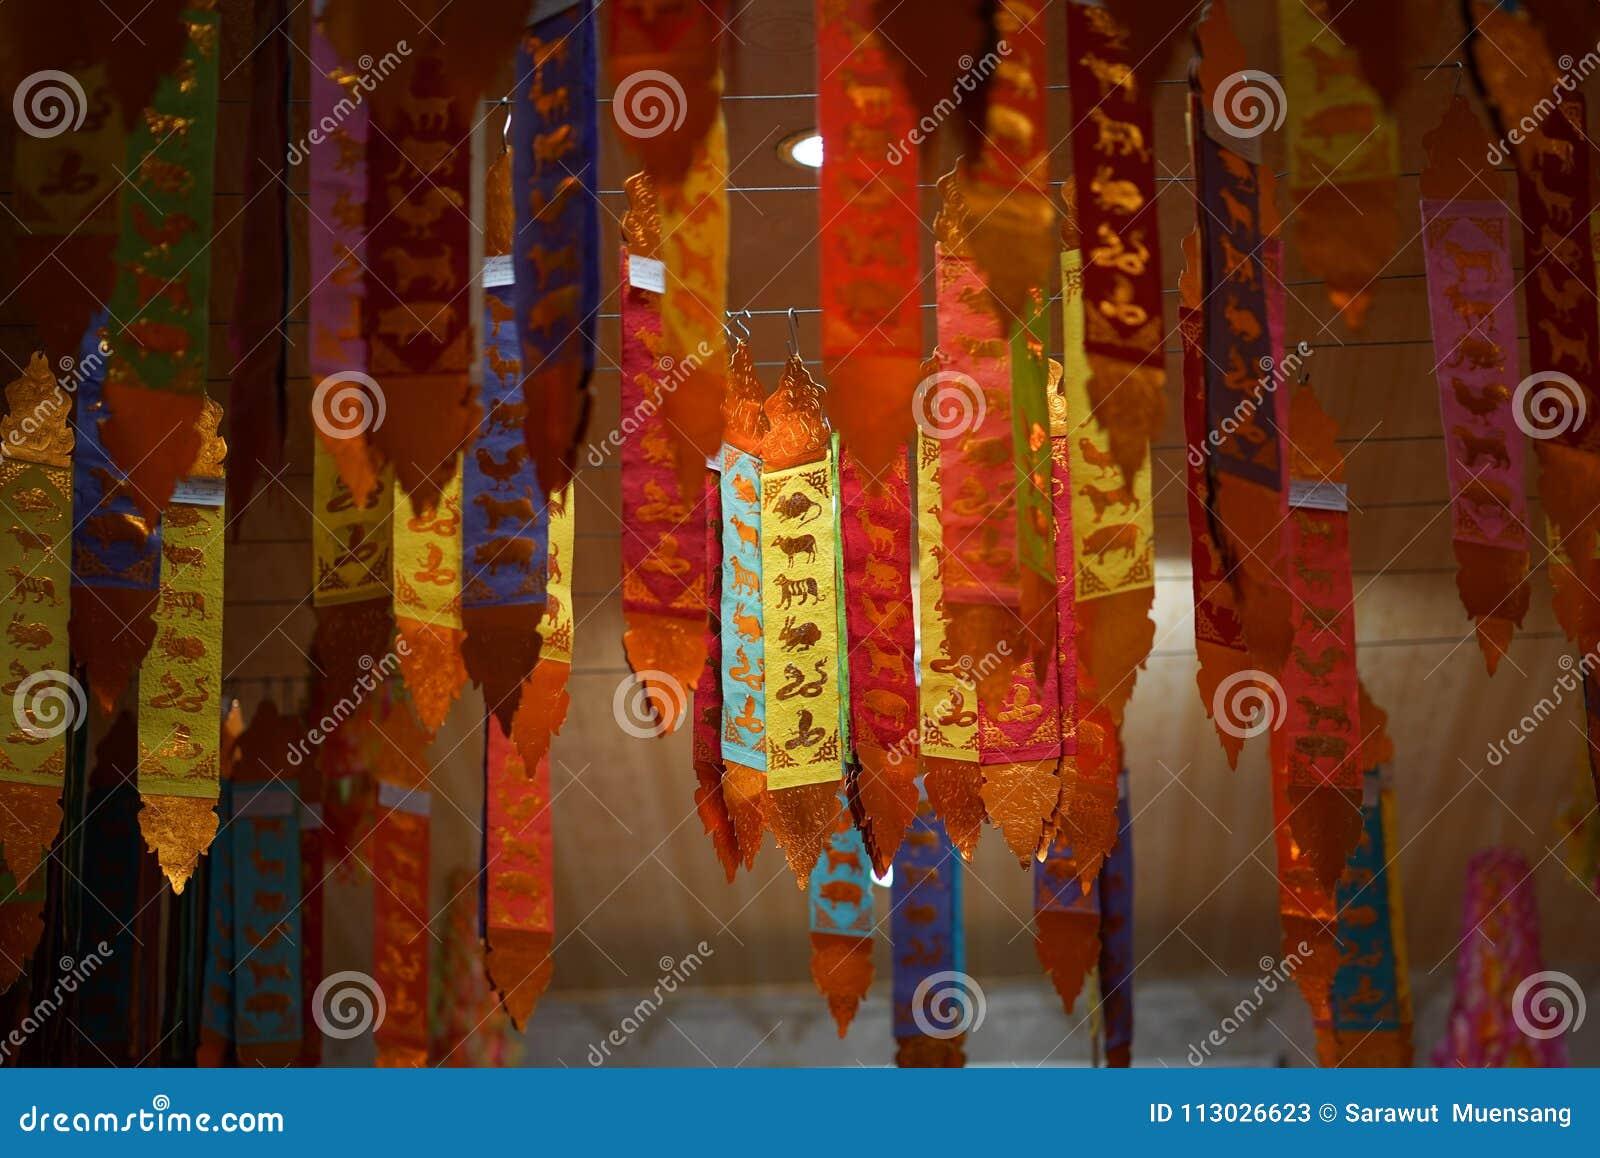 Bandera septentrional tradicional de Tung Thaiand, bandera vertical de 12 zodiacos, adornada en un templo budista